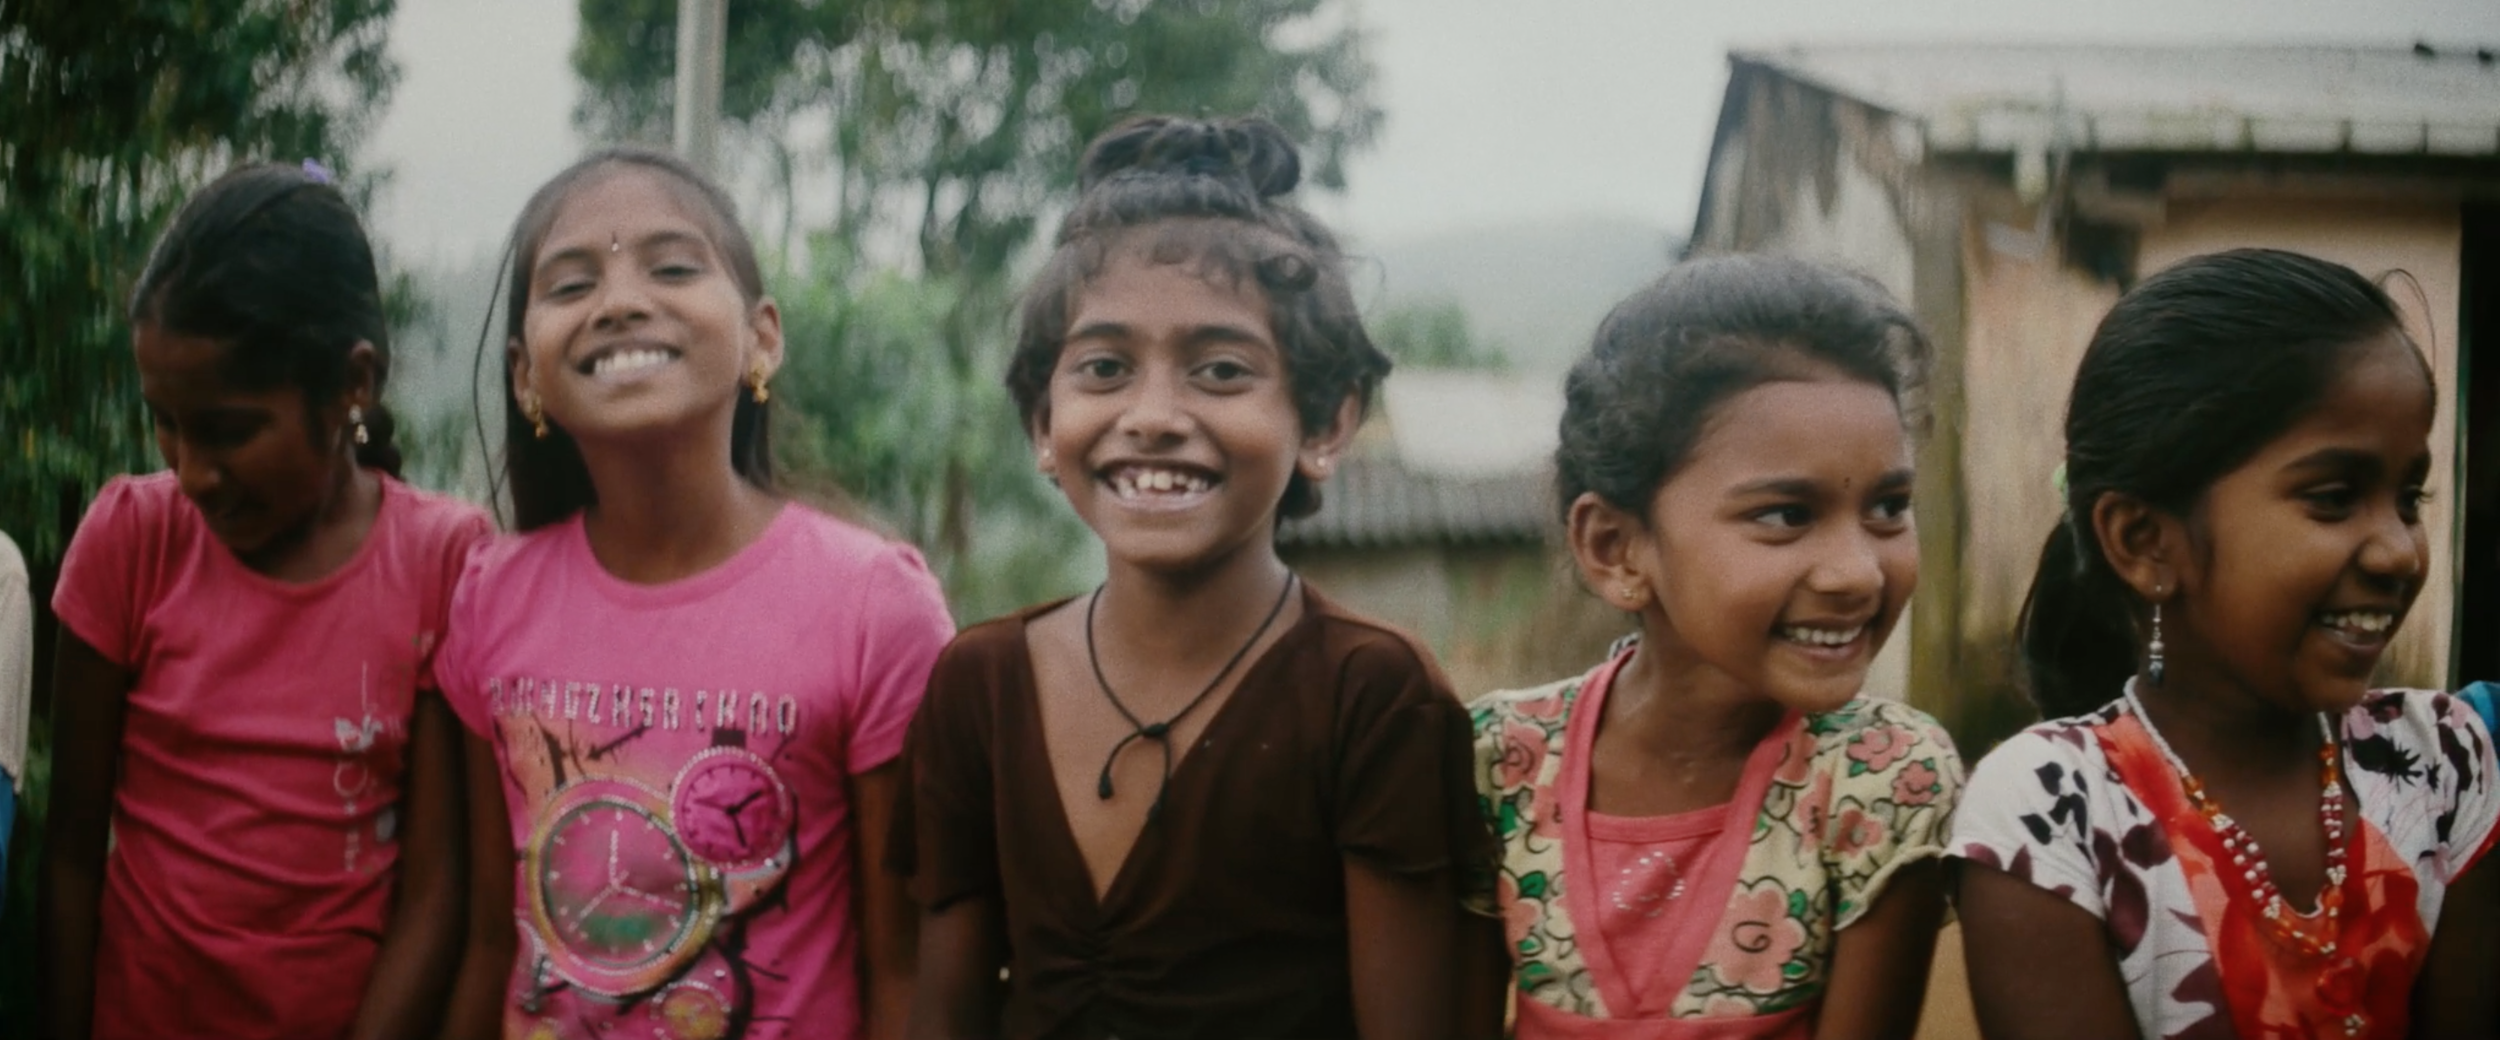 BLKFLM_VanessaBlack_SriLanka_Vogue_GapIncScreen Shot 2017-02-13 at 12.22.14 PM.png